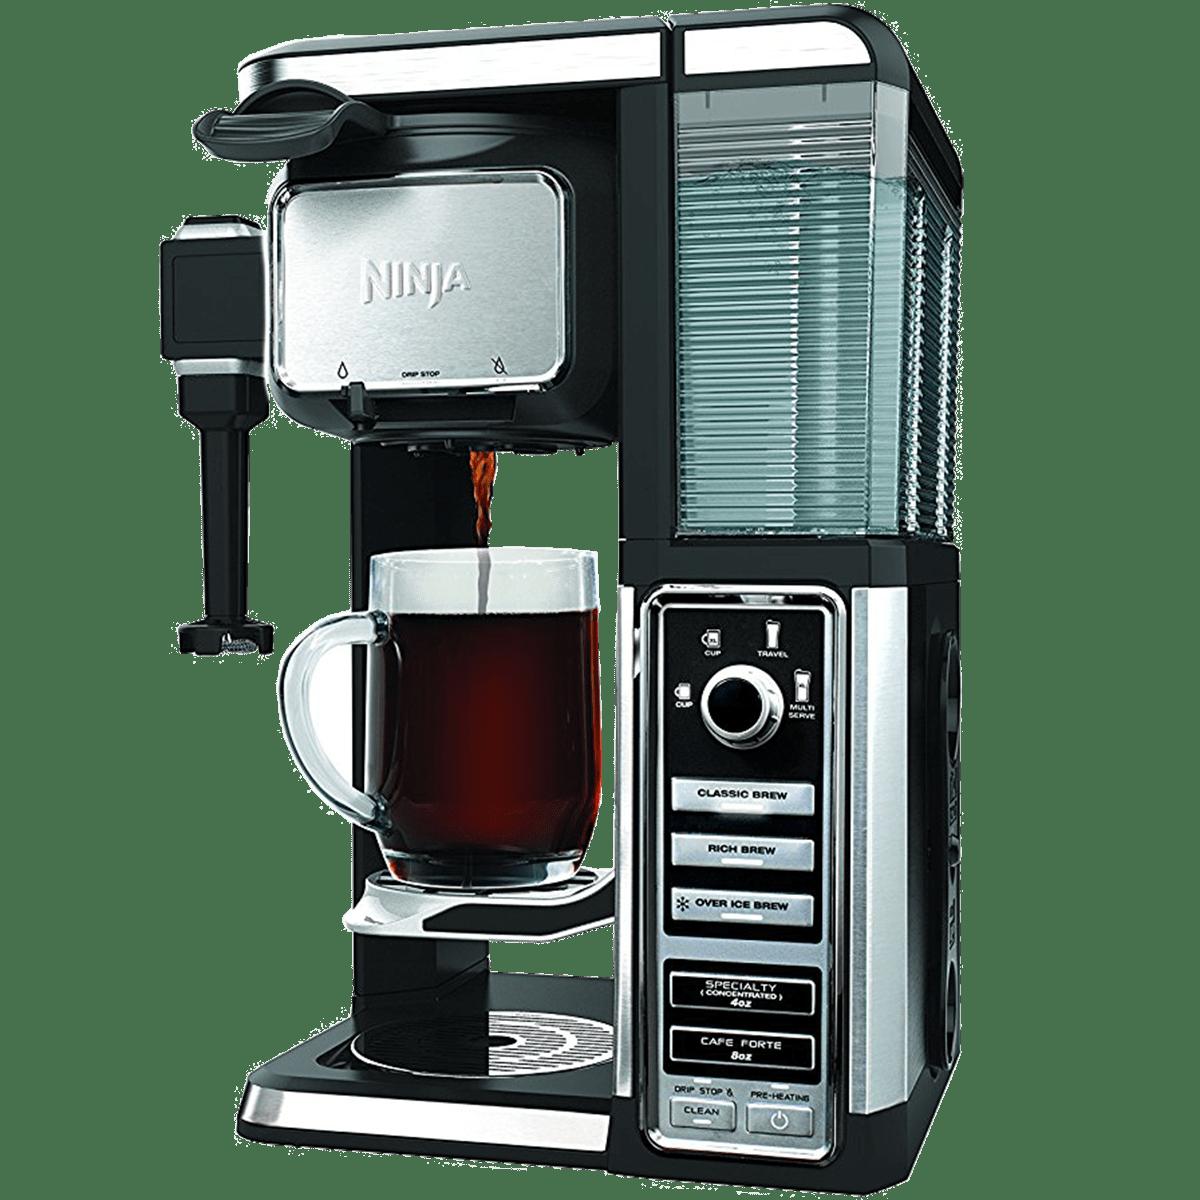 Ninja Coffee Maker Cleaning Instructions   Bruin Blog